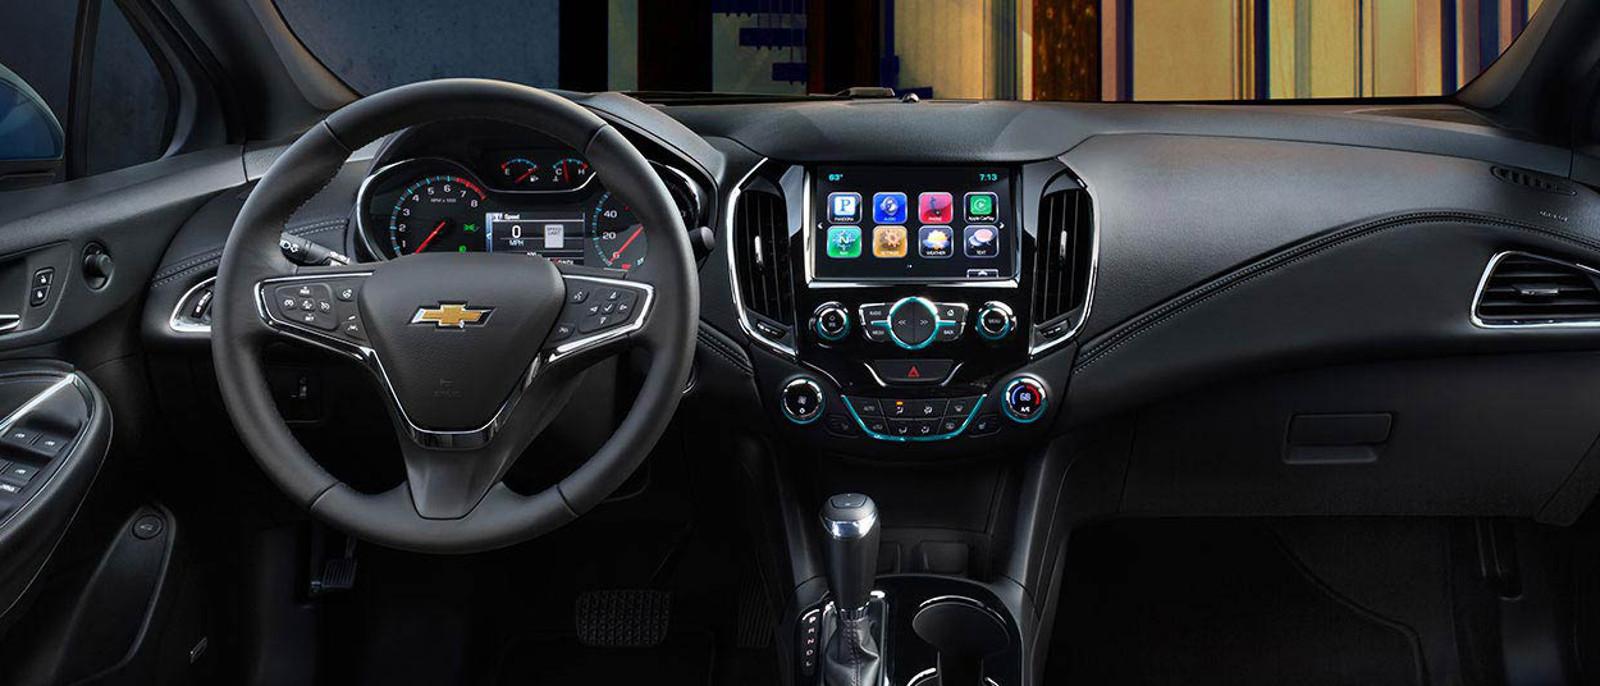 2016 Chevrolet Corvette Z06 front interior